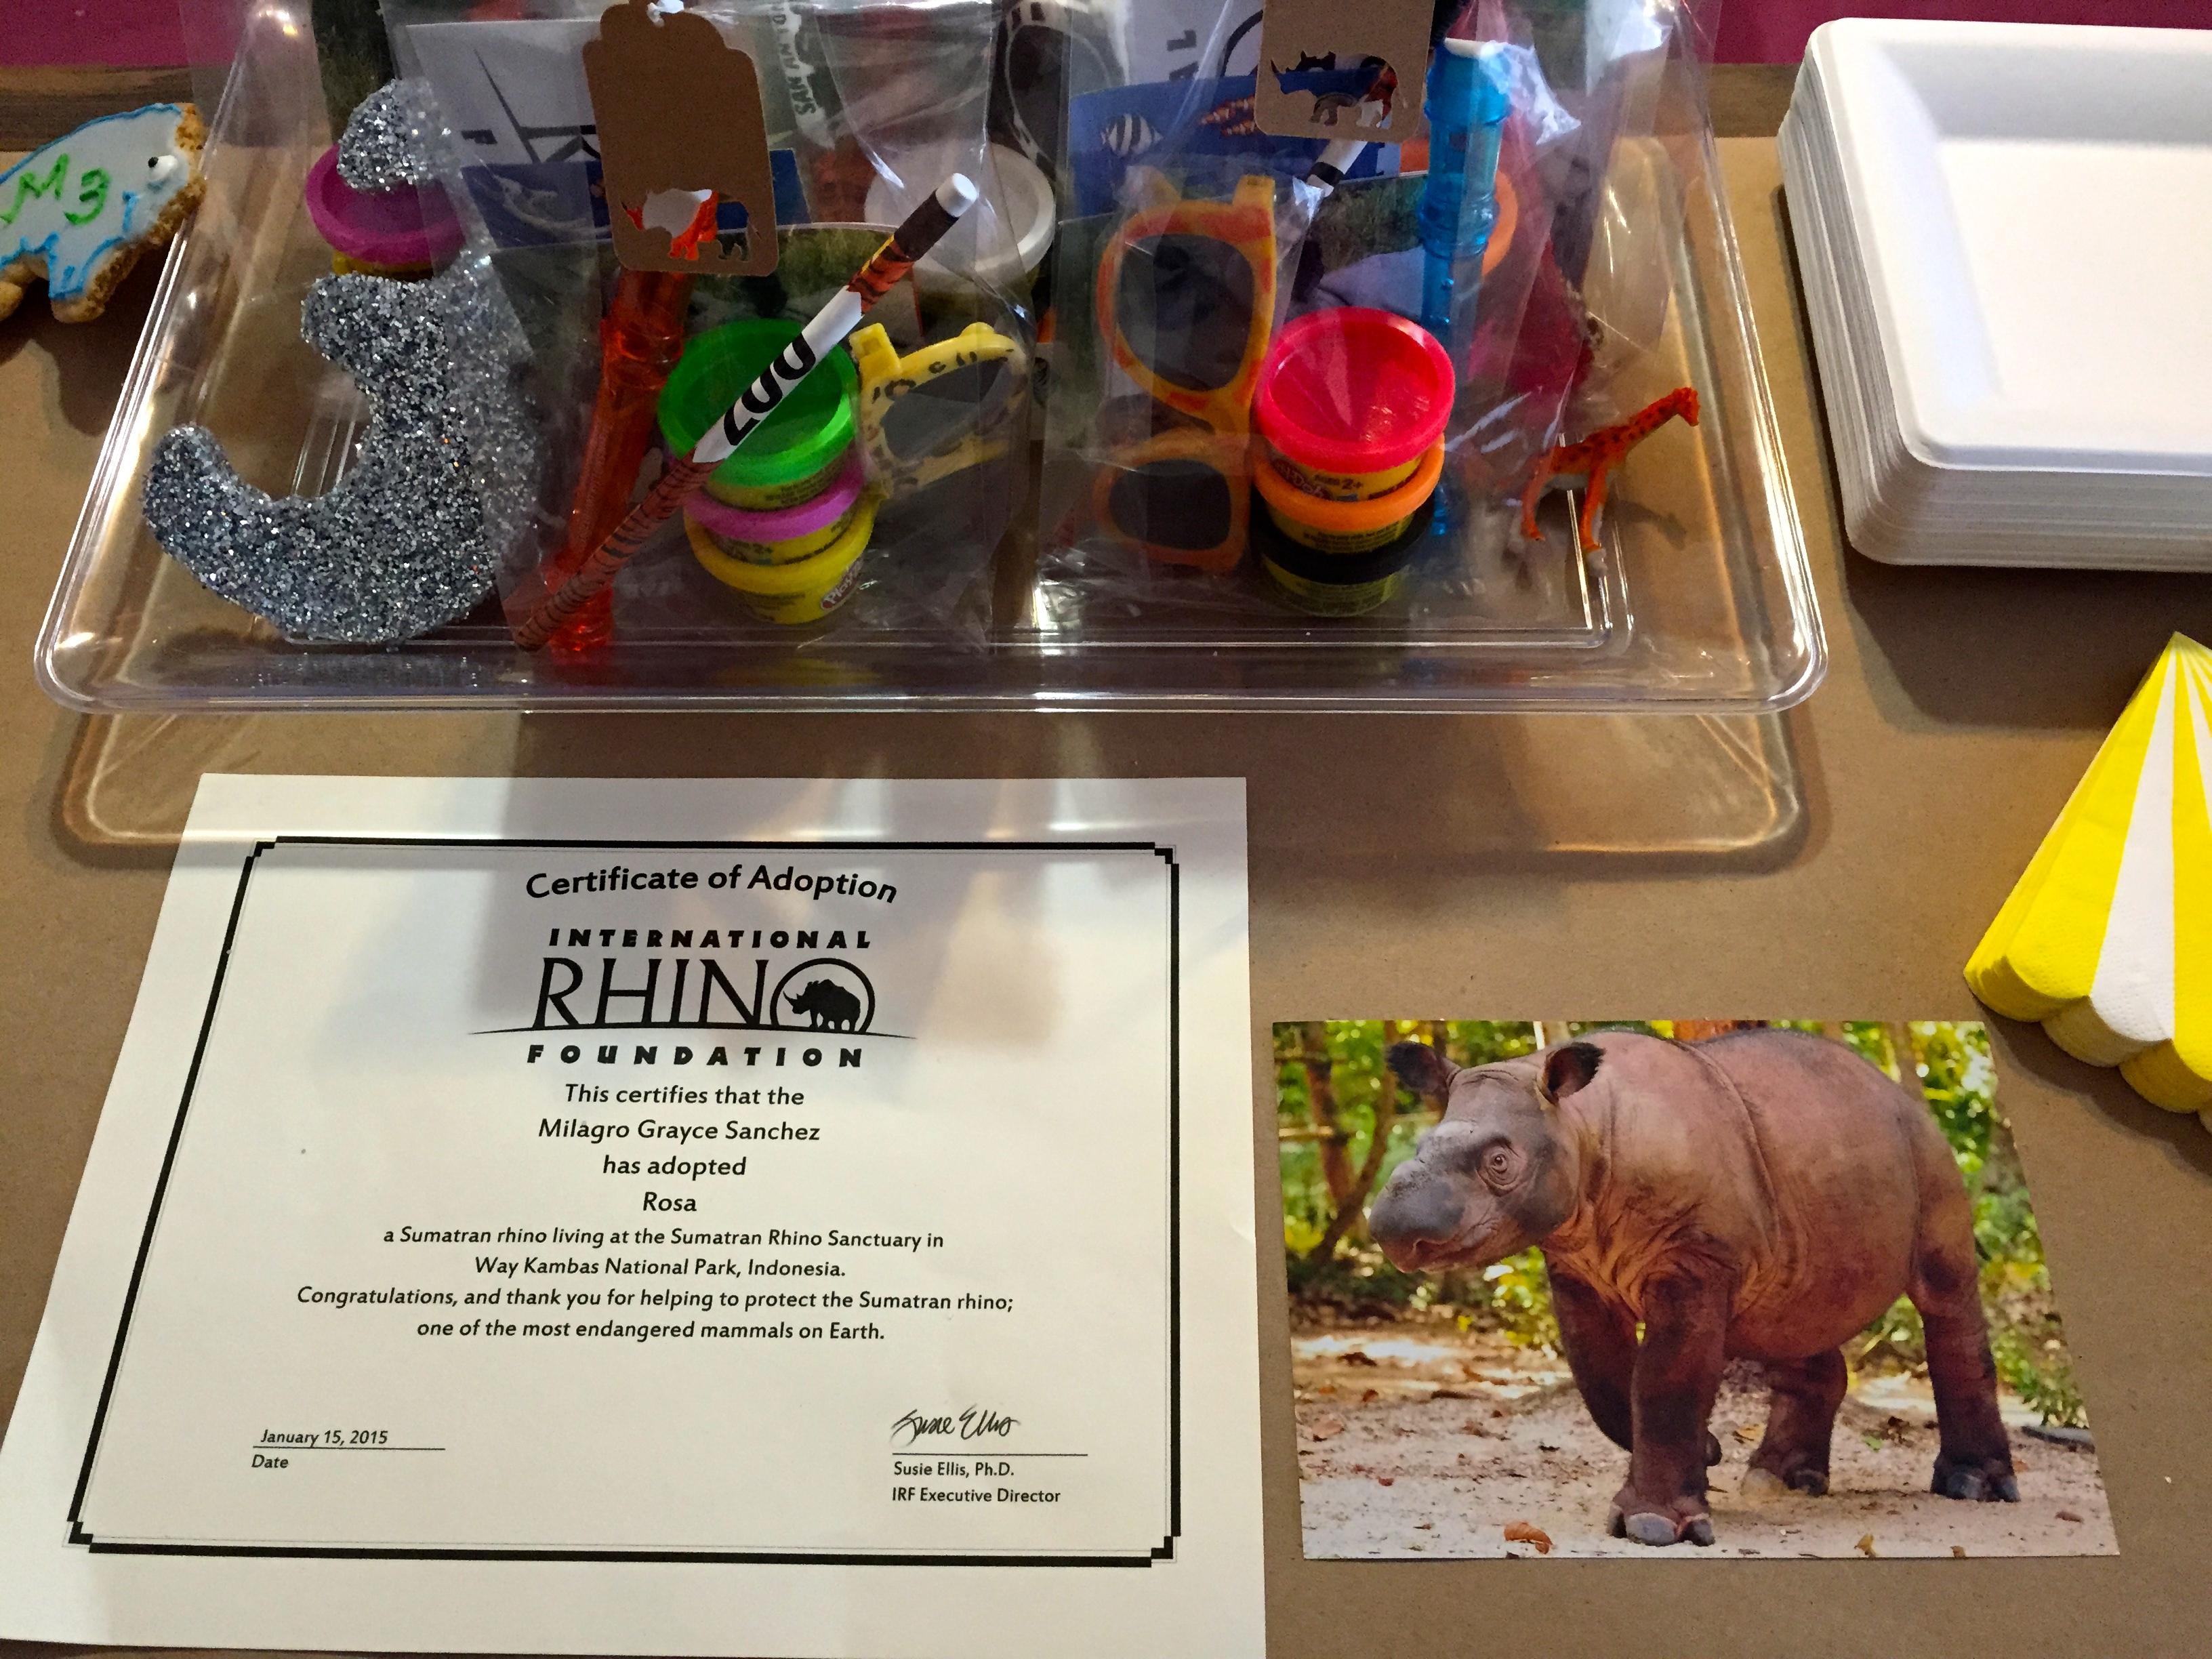 Rosa the Sumatran Rhino Adoption Kit